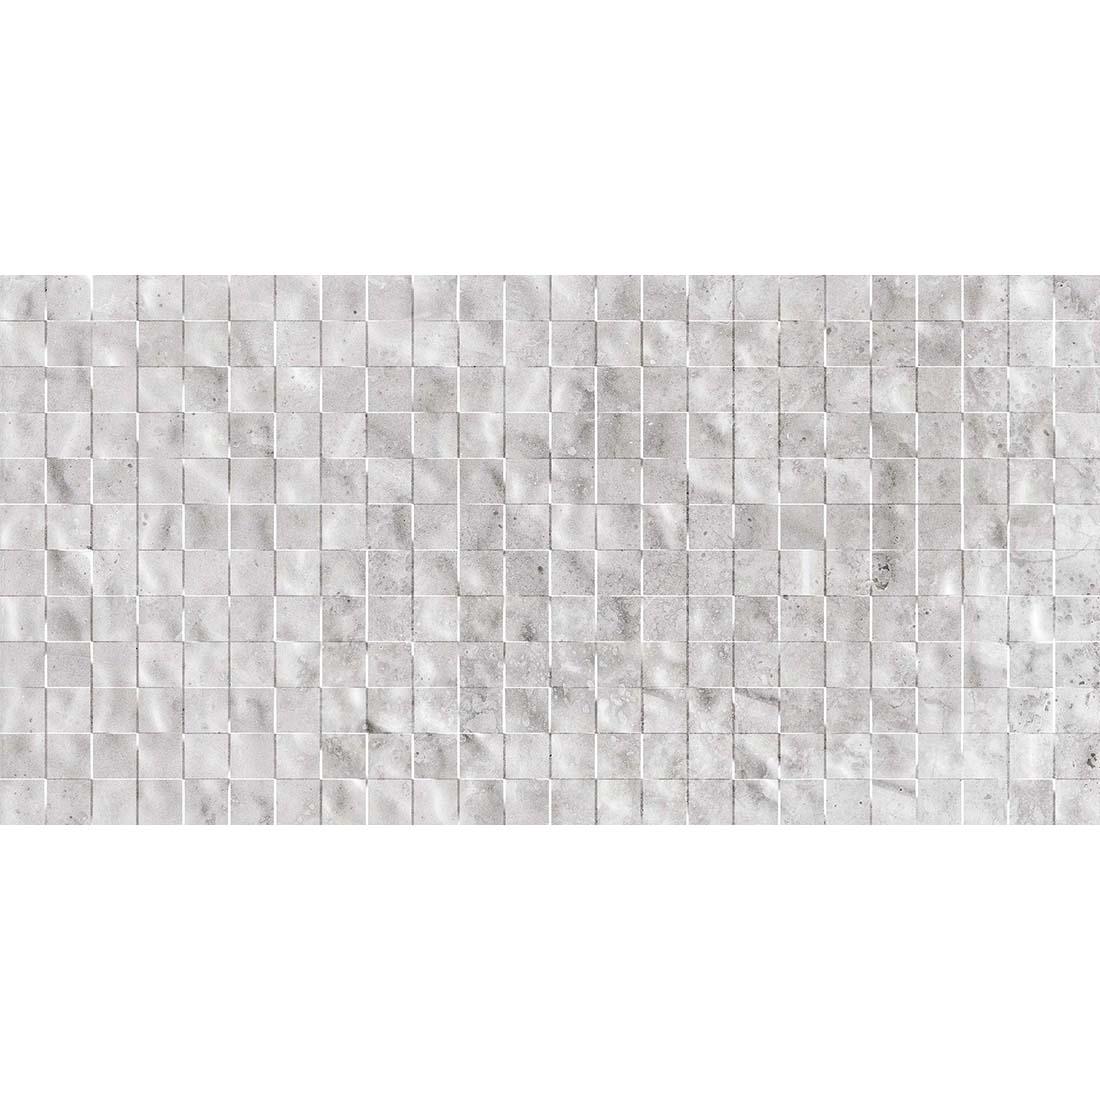 Roma Stonex Decor 30x60 Bianco Gloss 1